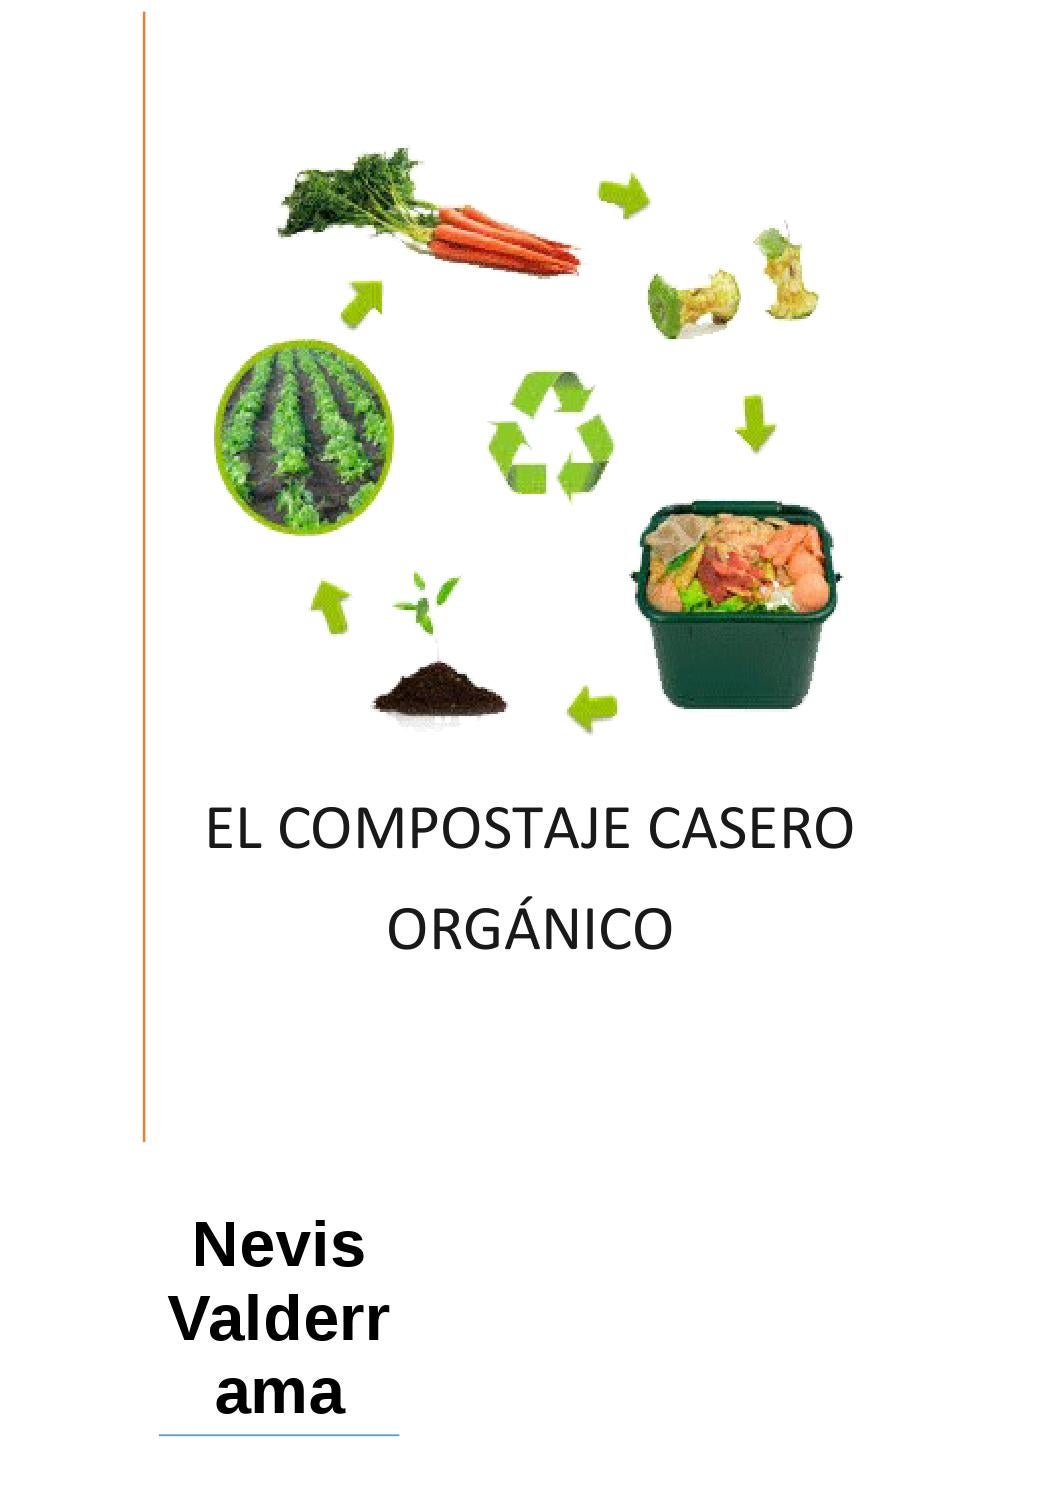 El compostaje casero orgánico by nevis - issuu